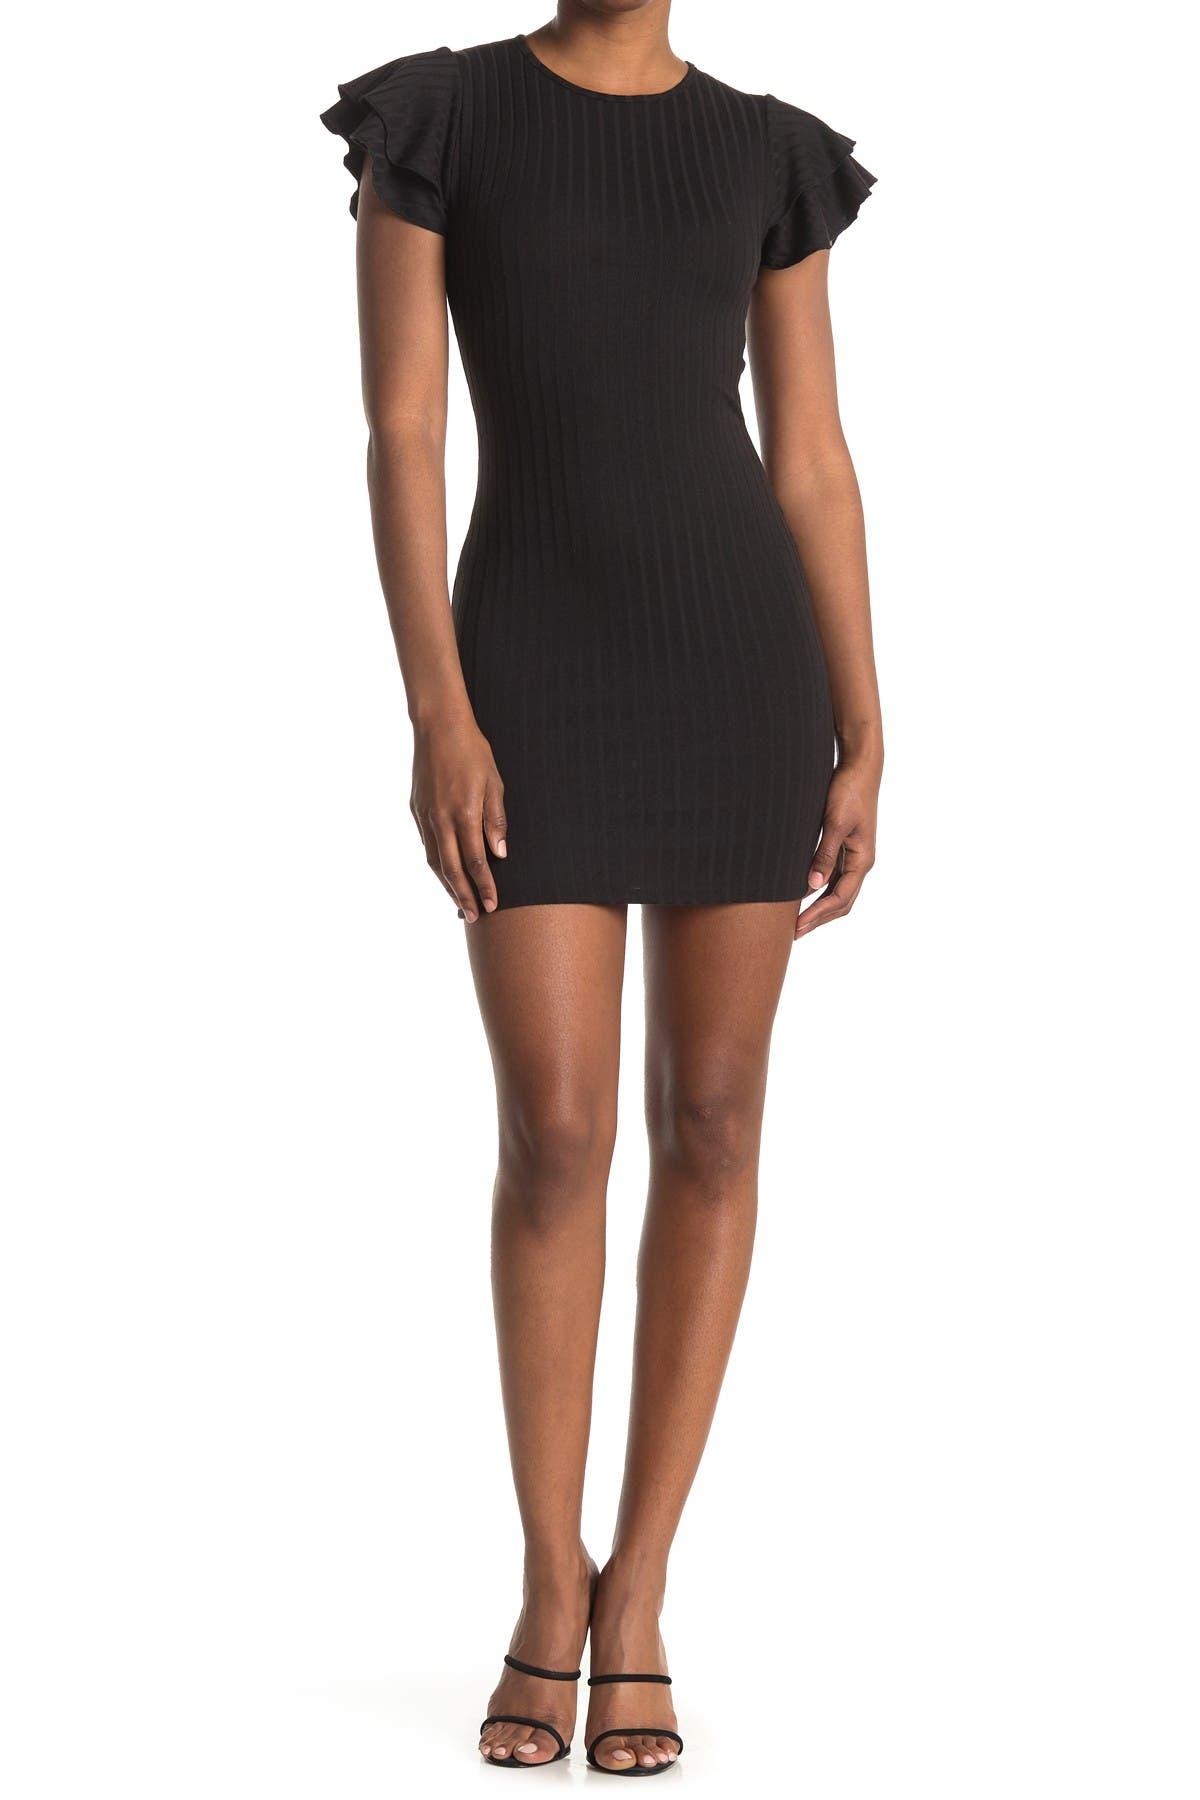 Image of Velvet Torch Ruffle Sleeve Ribbed Bodycon Mini Dress